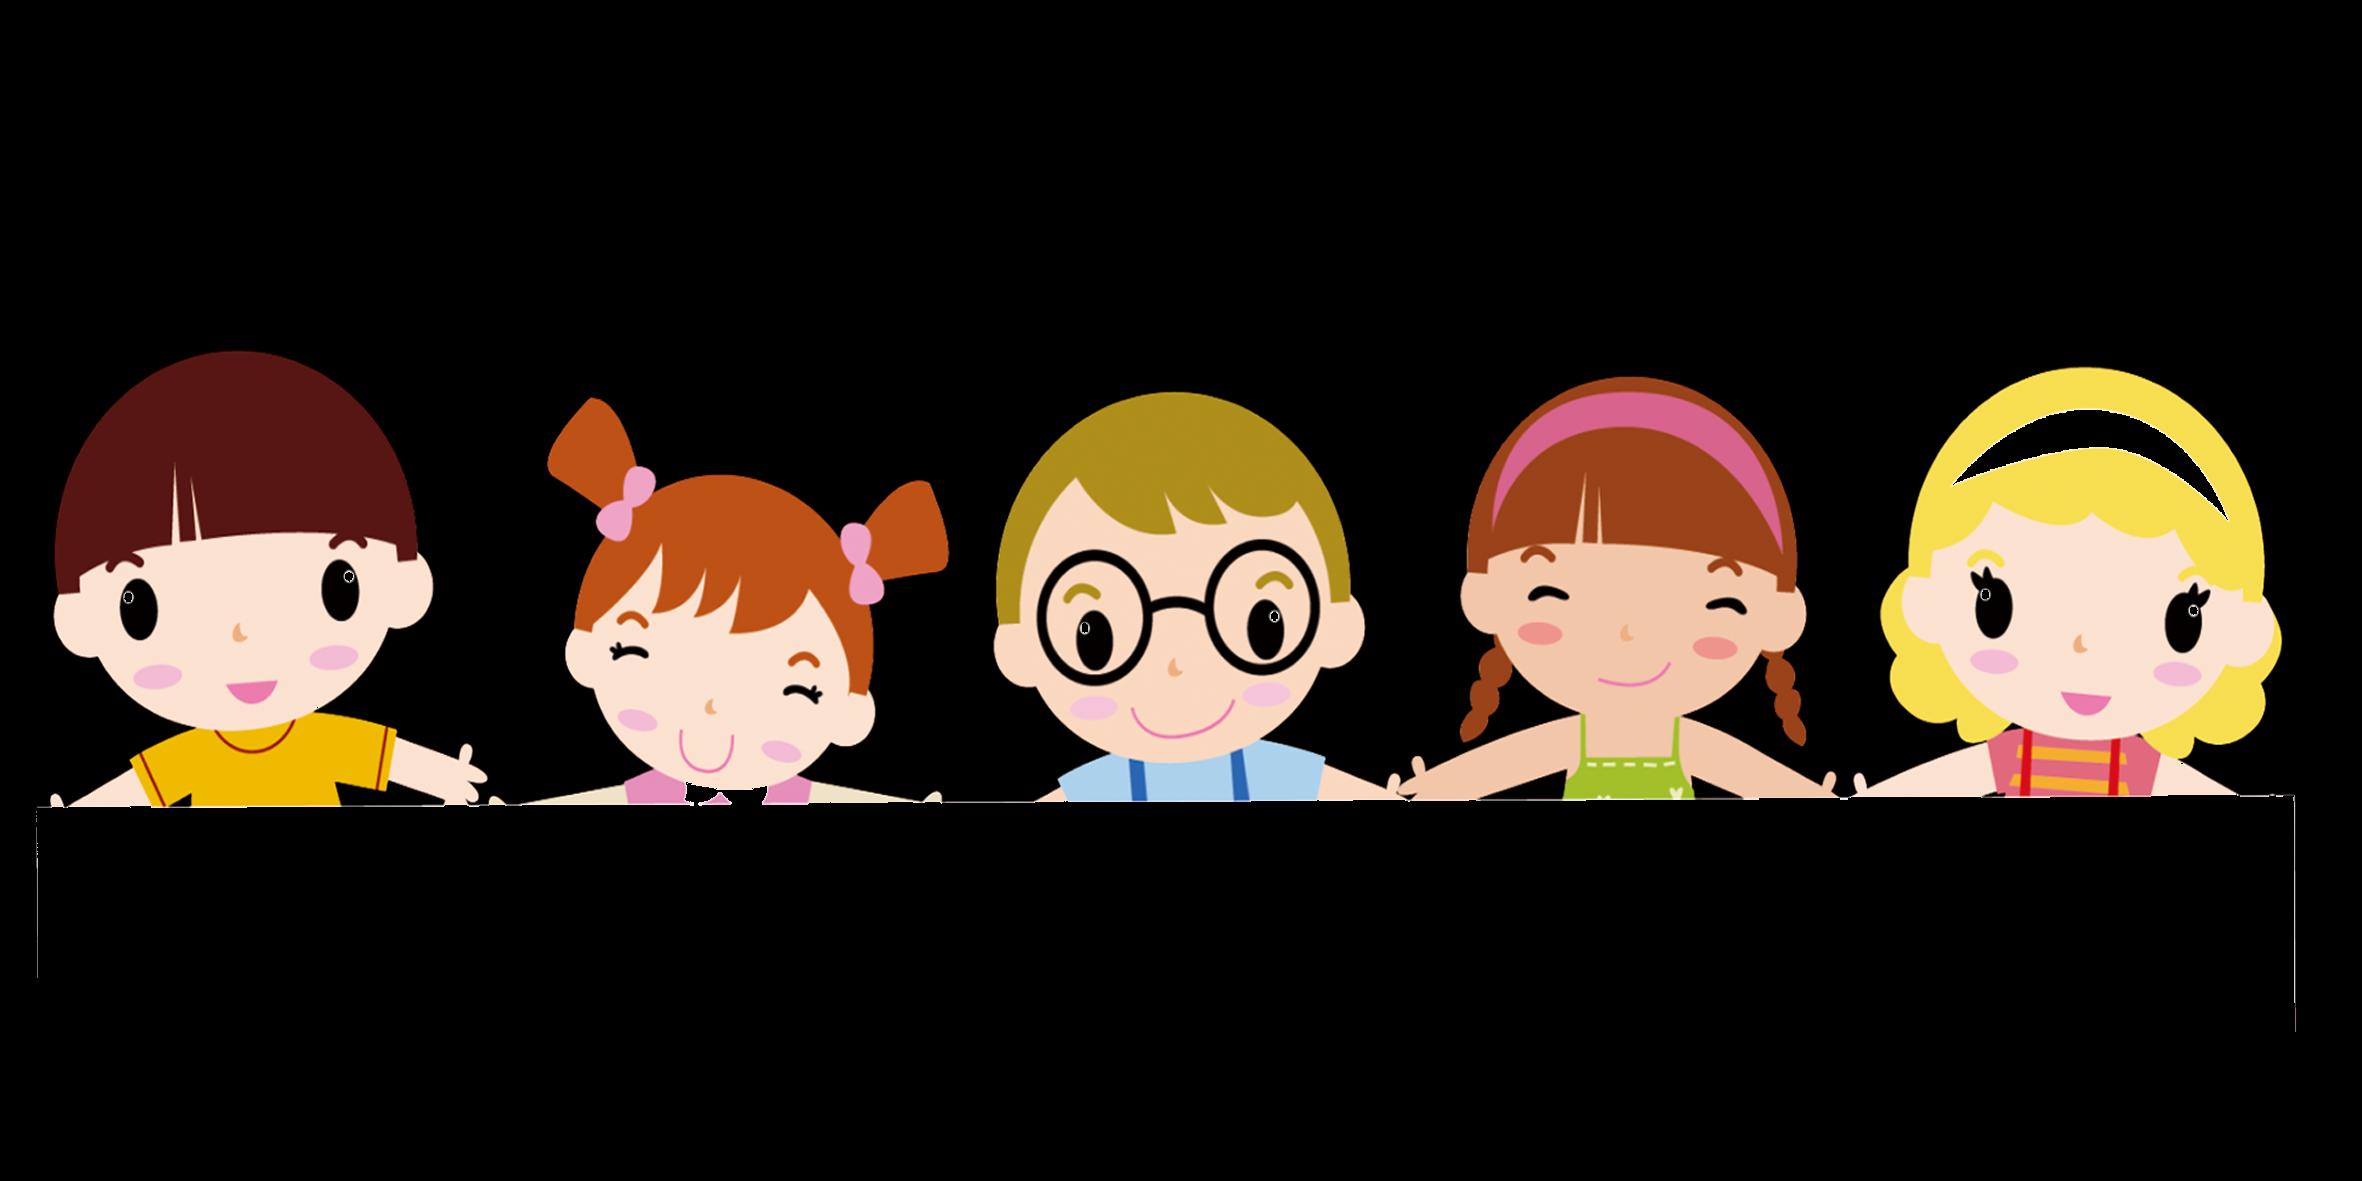 Kindergarten clipart kindergarten child. Teacher illustration children transprent